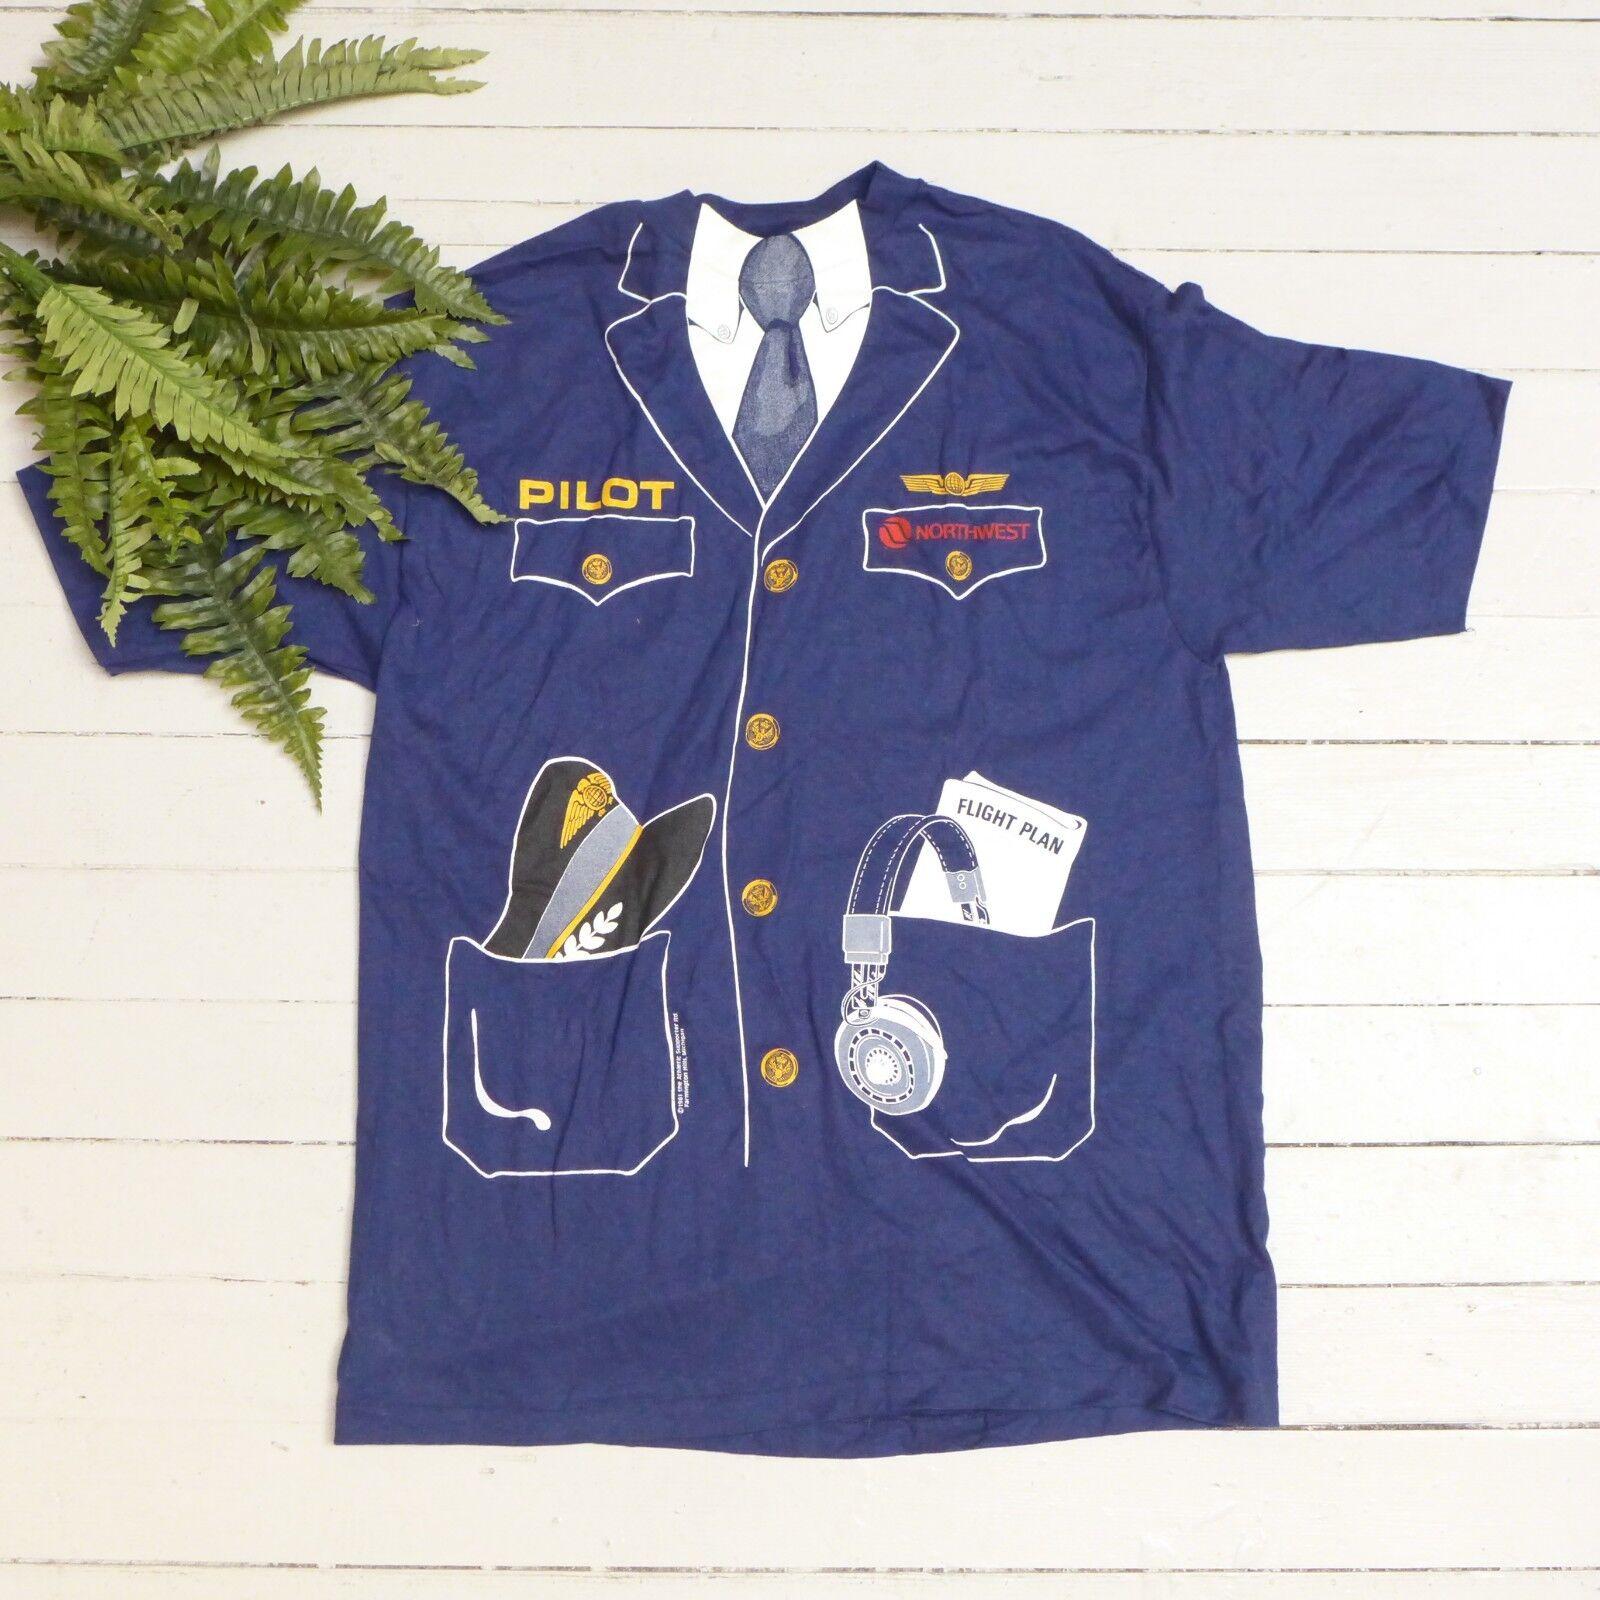 1eab69f640f812 Vintage 1981 Beefy Hanes Northwest Airlines Pilot Suit Pattern Shirt Size XL